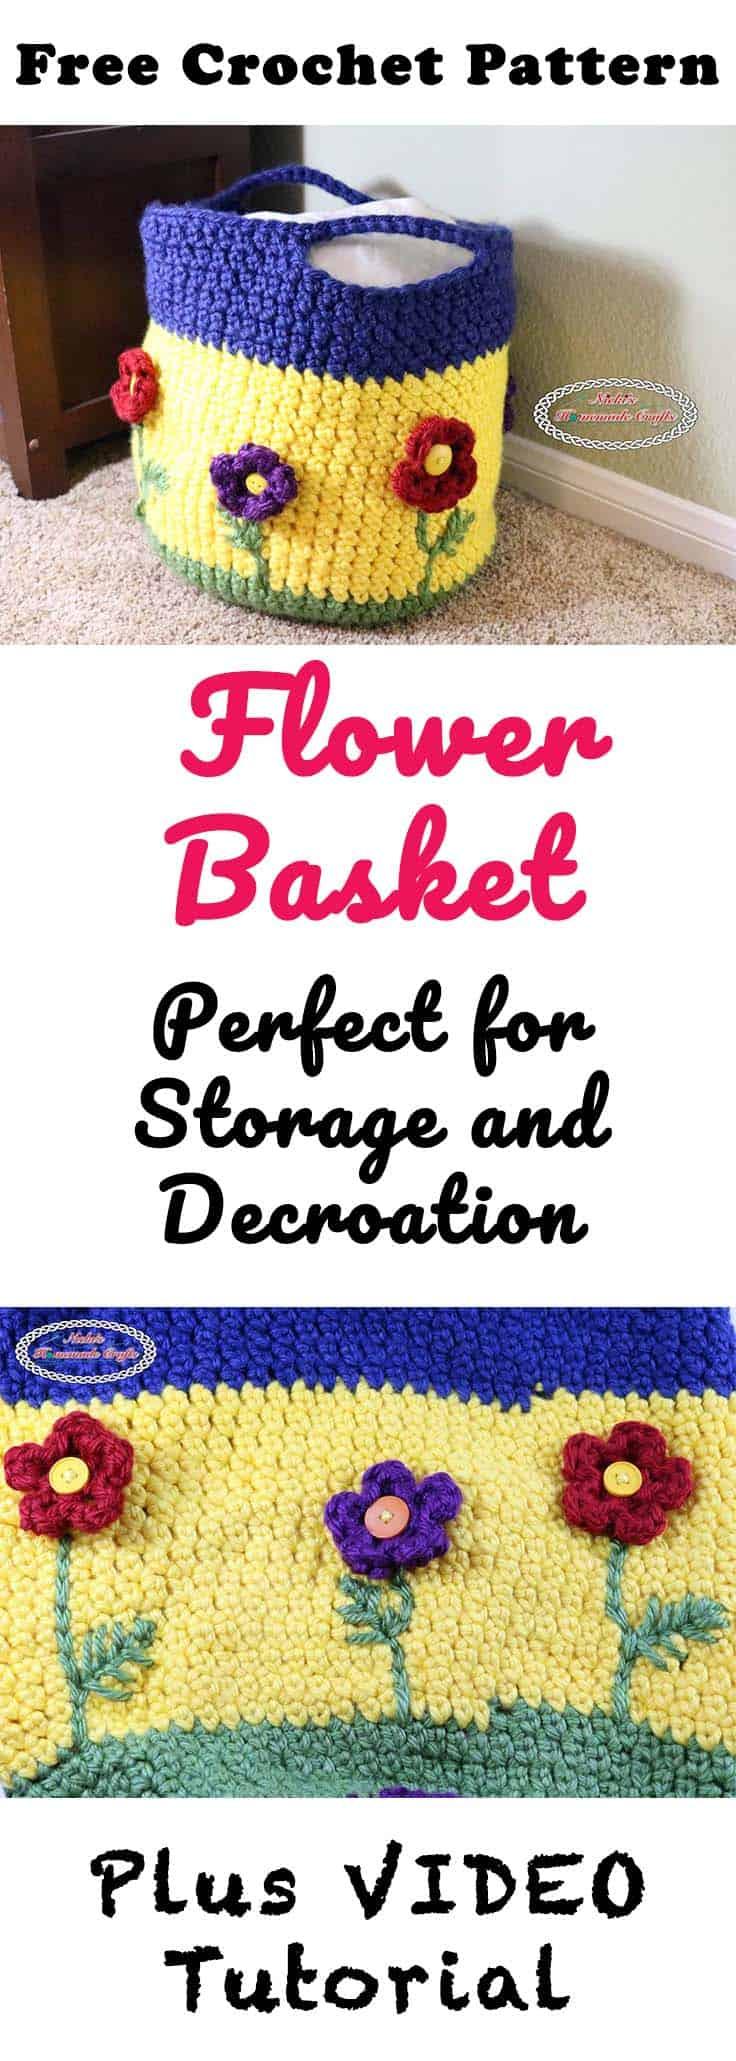 Flower Basket Free Crochet Pattern by Nicki's Homemade Crafts #crochet #flower #basket #spring #button